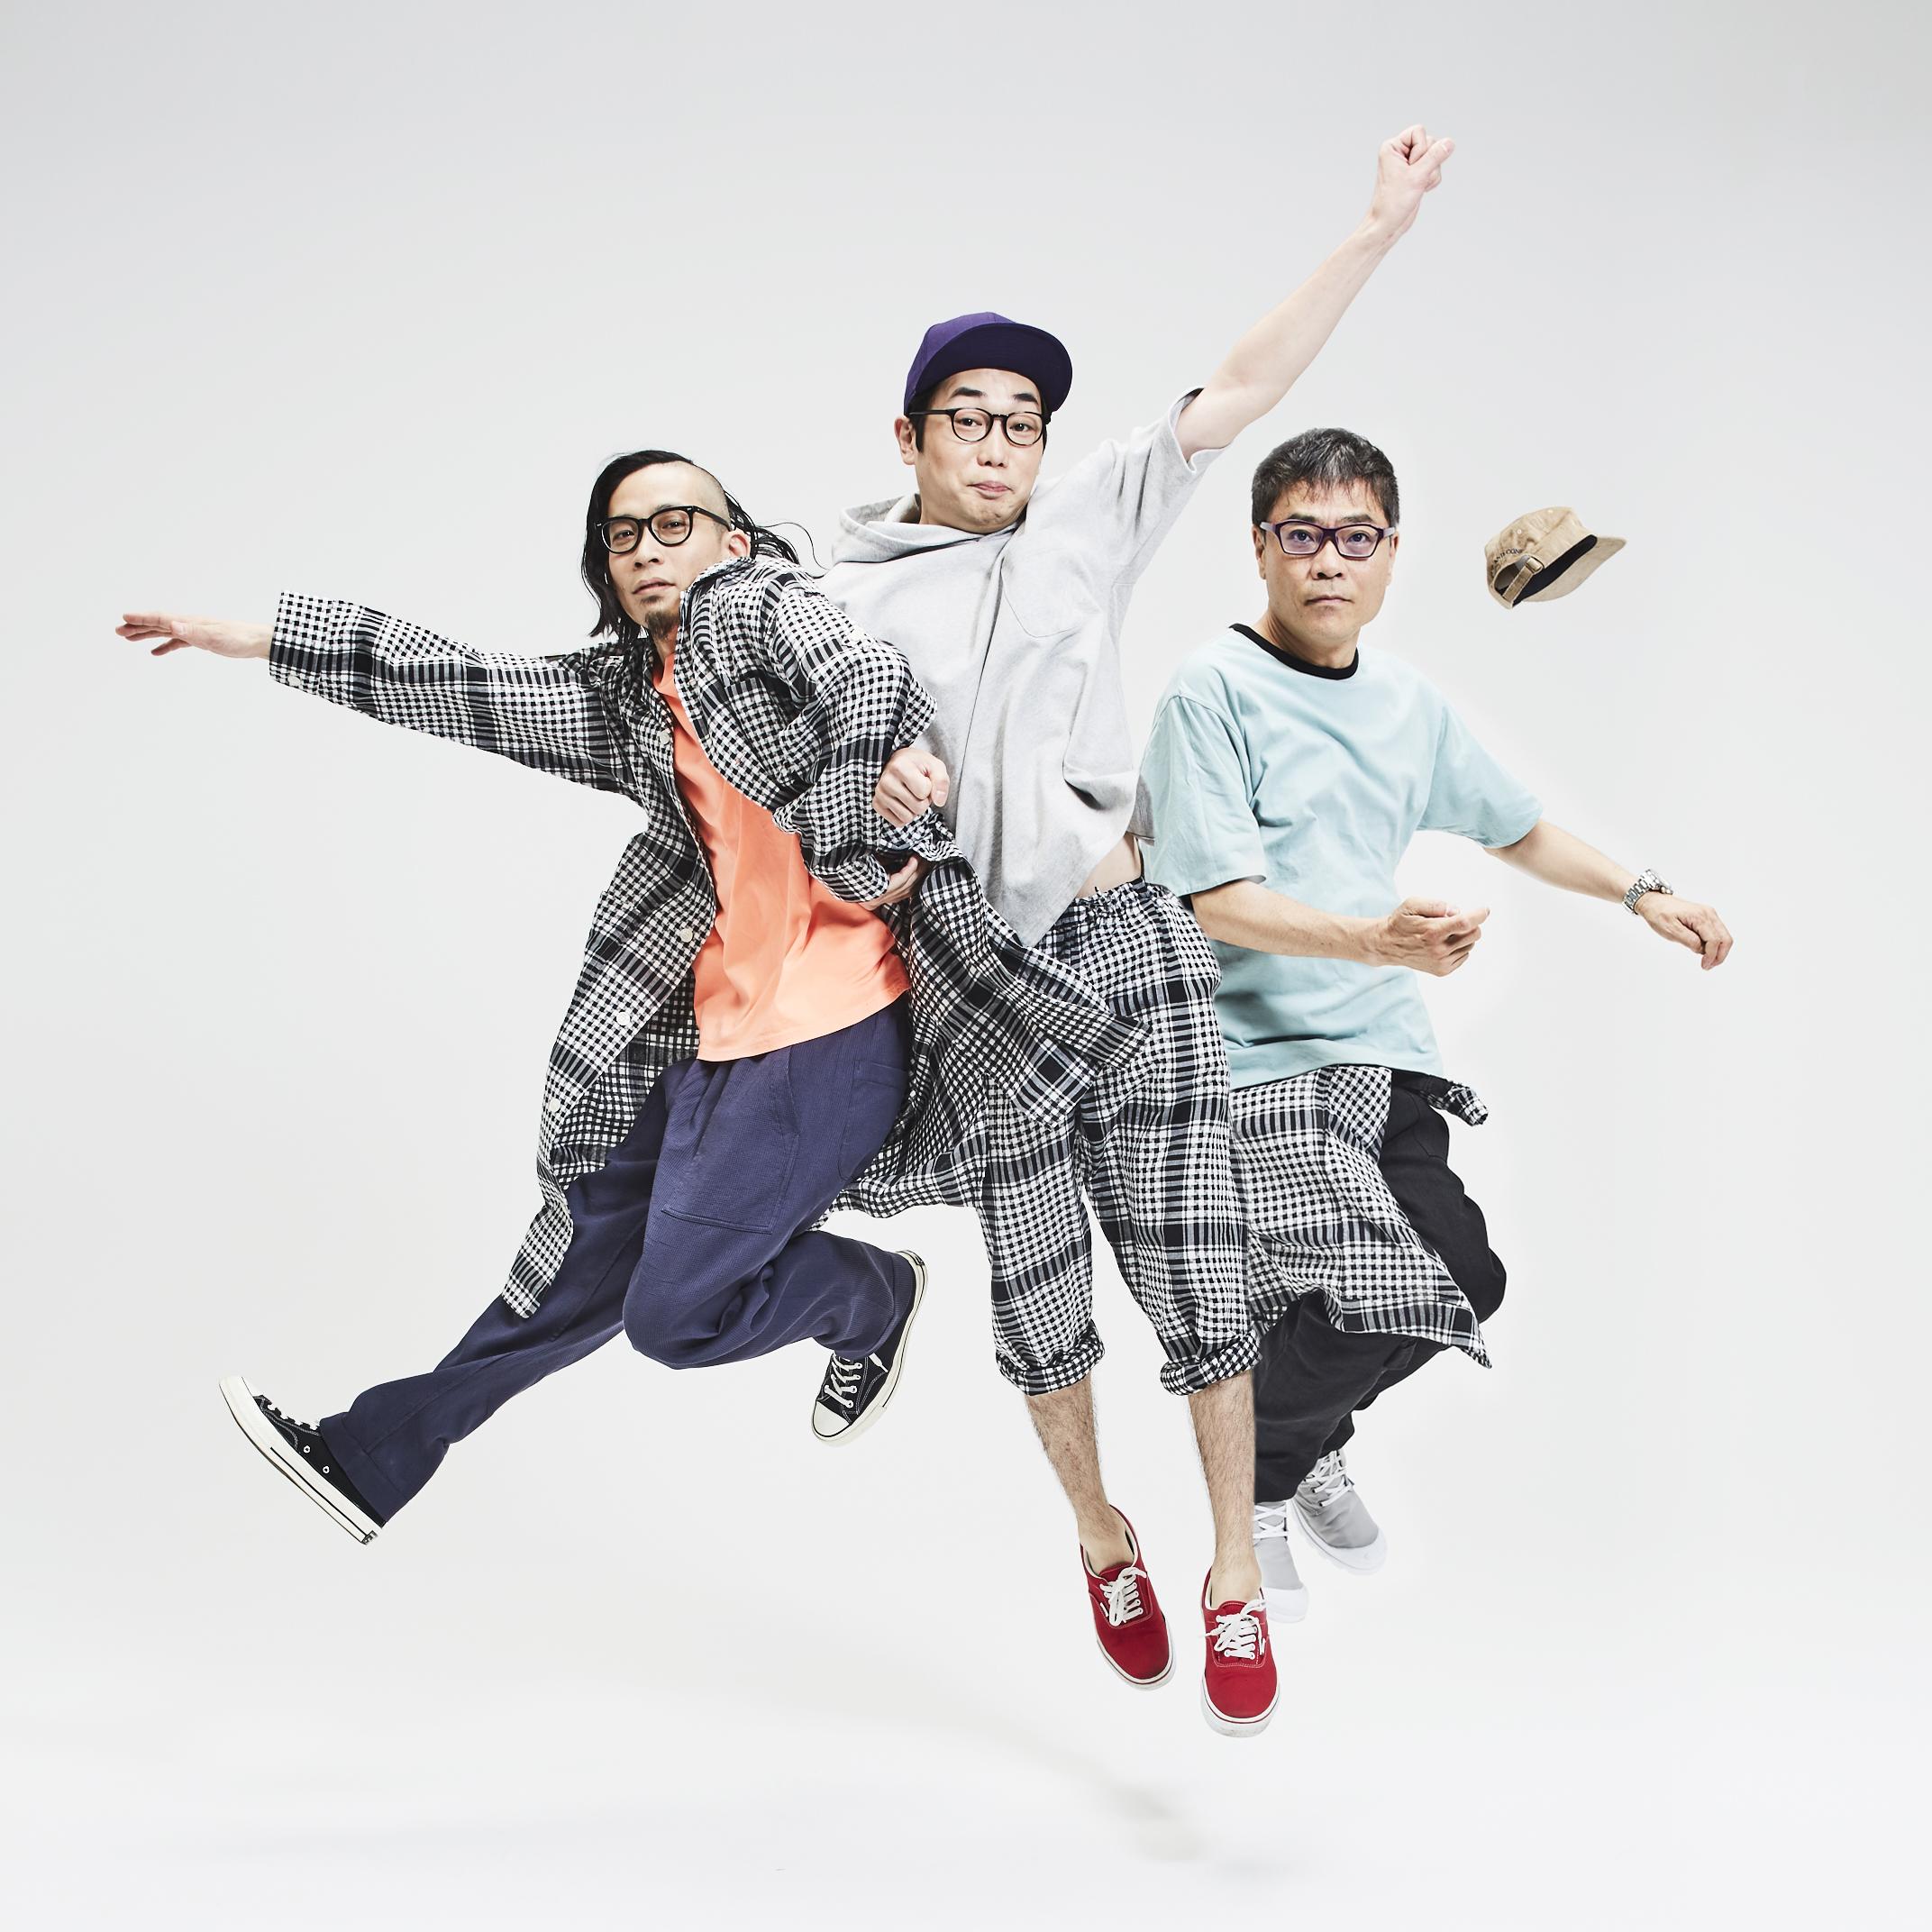 L→R 村田シゲ、三浦康嗣、いとうせいこう